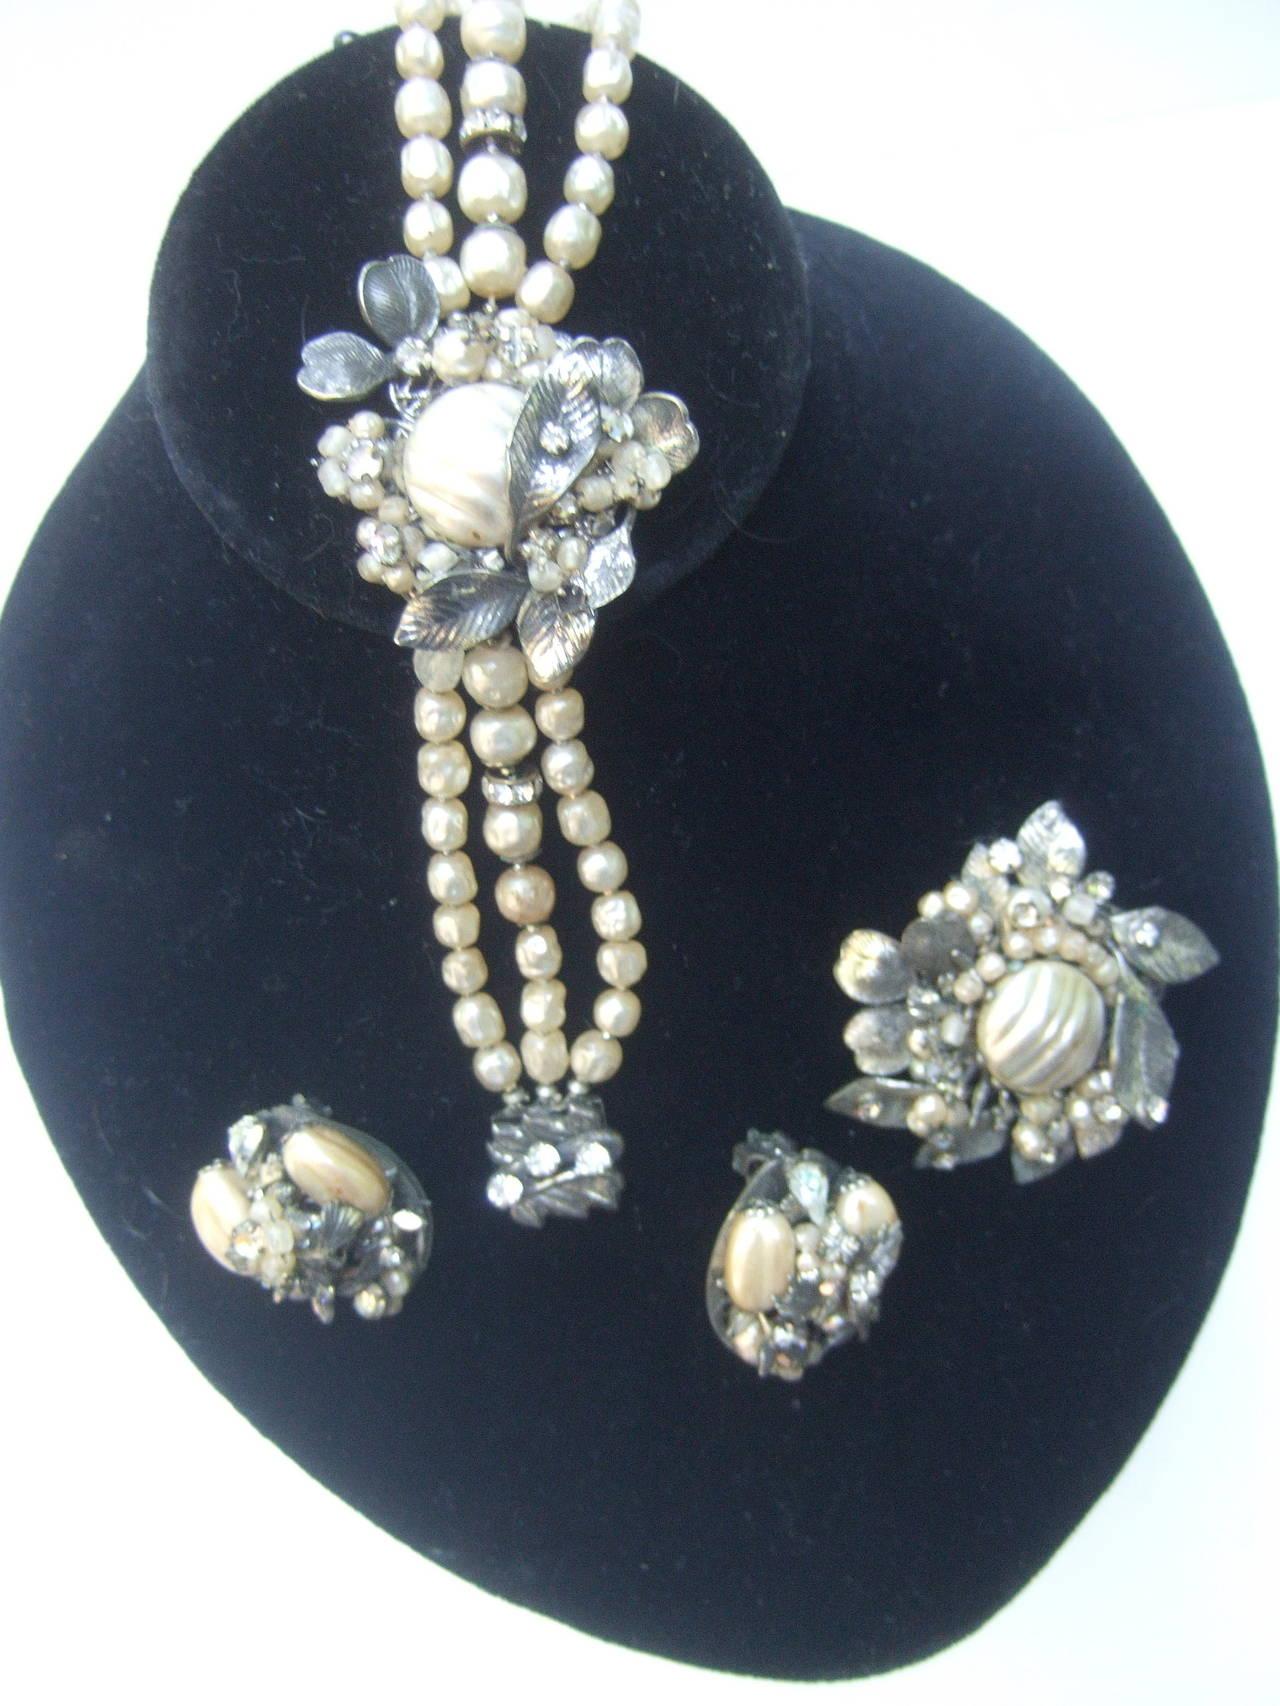 1950s Costume Pearl Brooch, Bracelet & Earrings by Robert In Good Condition For Sale In Santa Barbara, CA